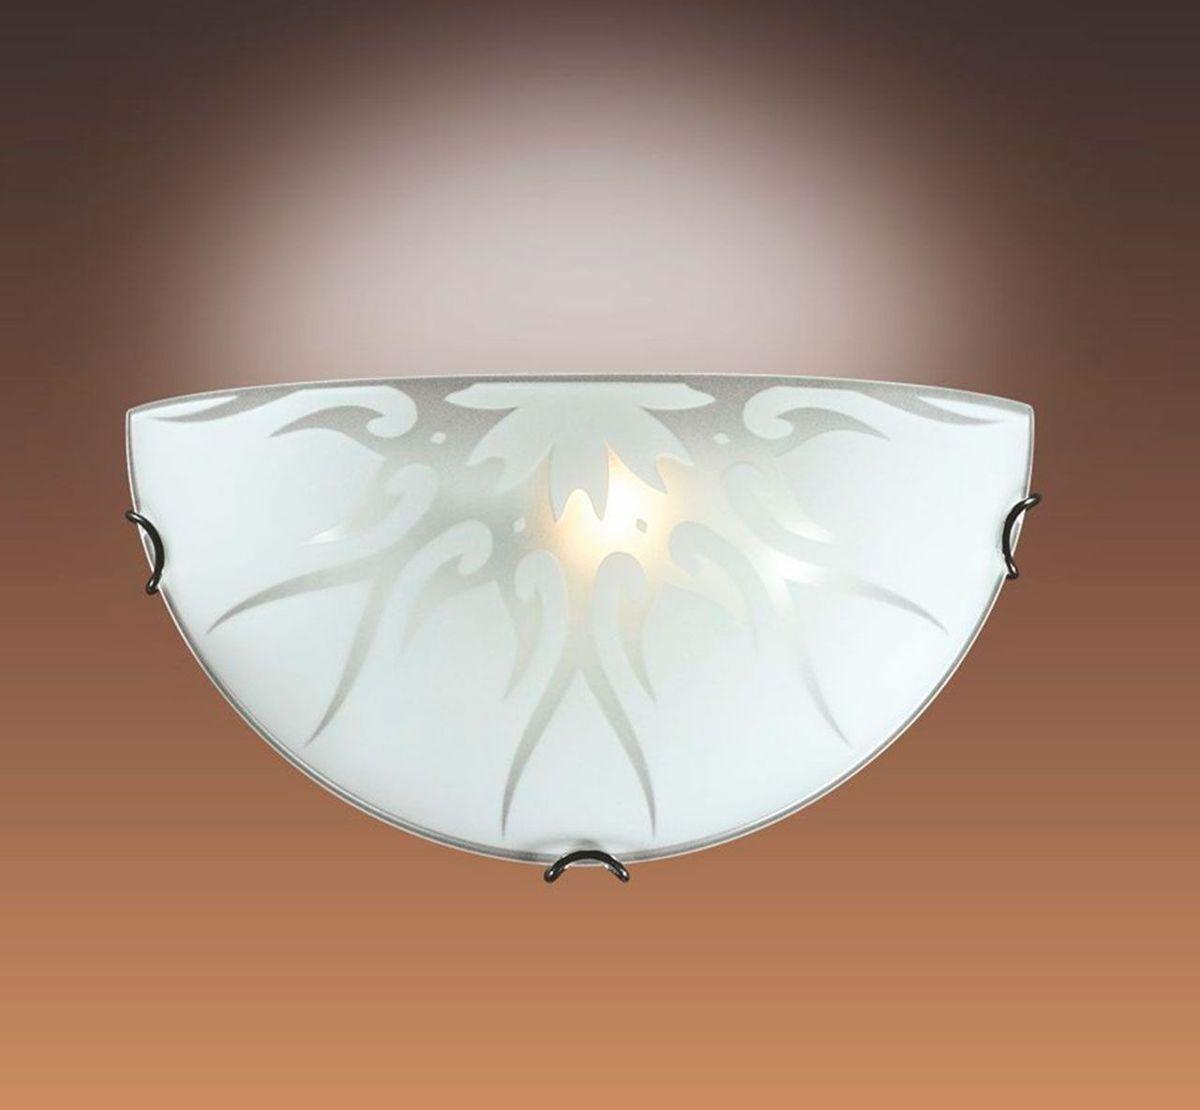 Cветильник настенный Sonex Nori, 1 х E27, 100W. 050050